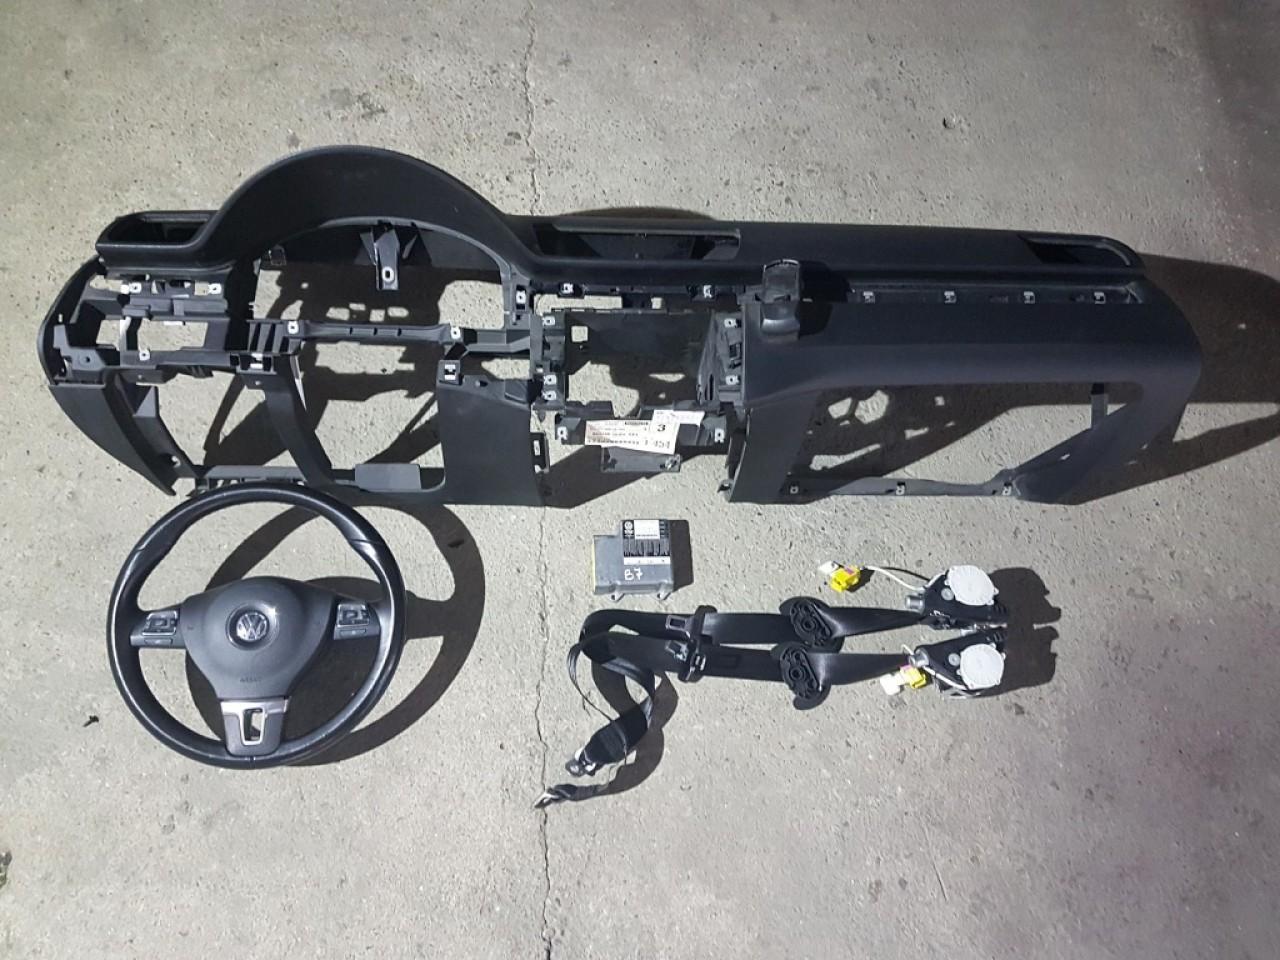 Kit airbag-uri vw passat b7 2011-2015